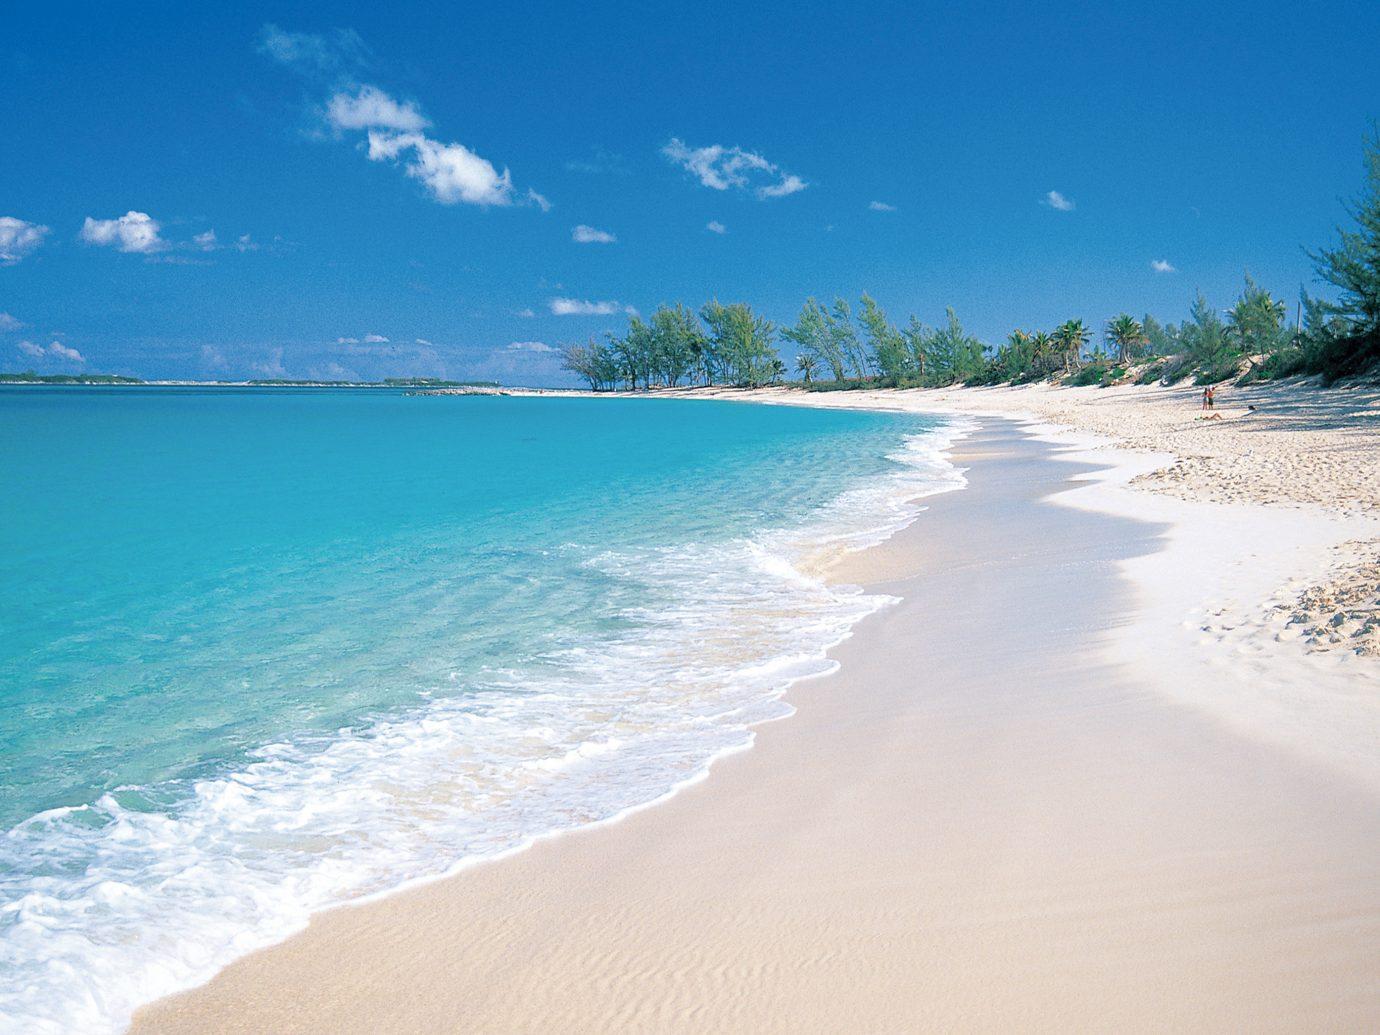 Beach at Four Seasons Ocean Club Bahamas